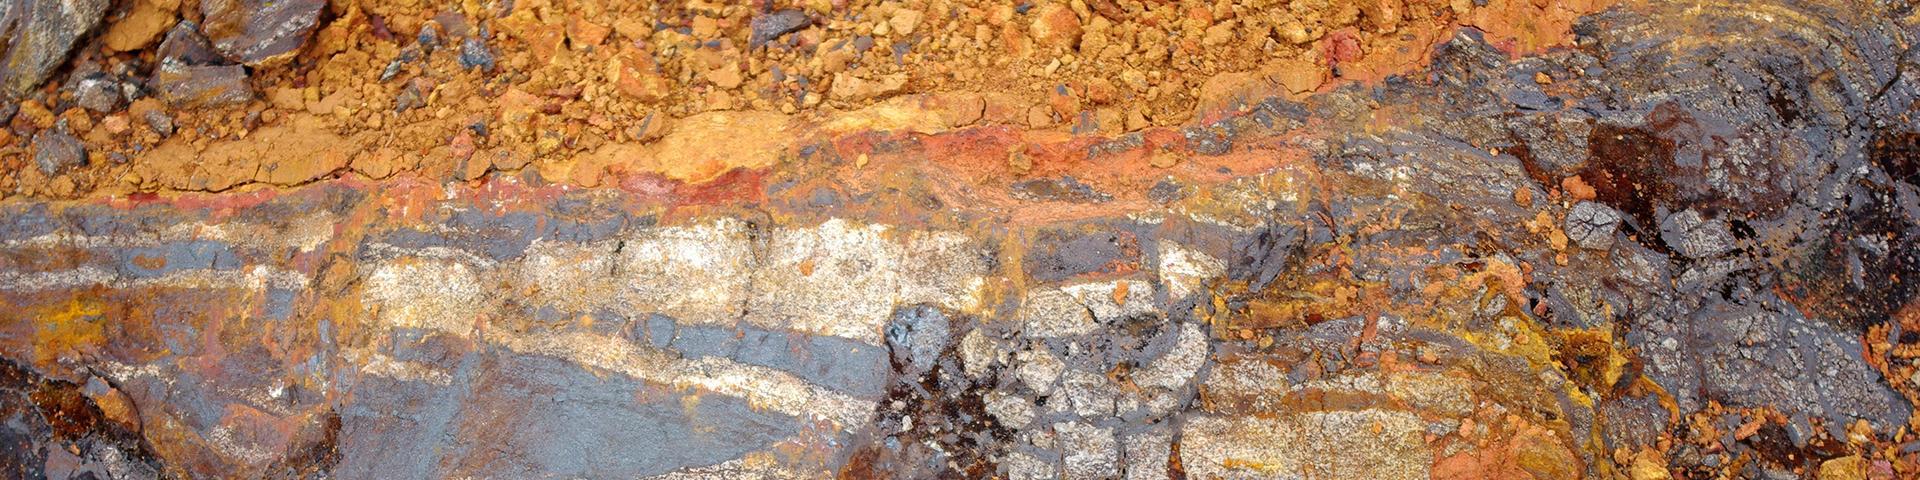 Mining exploration campaign, Guinea